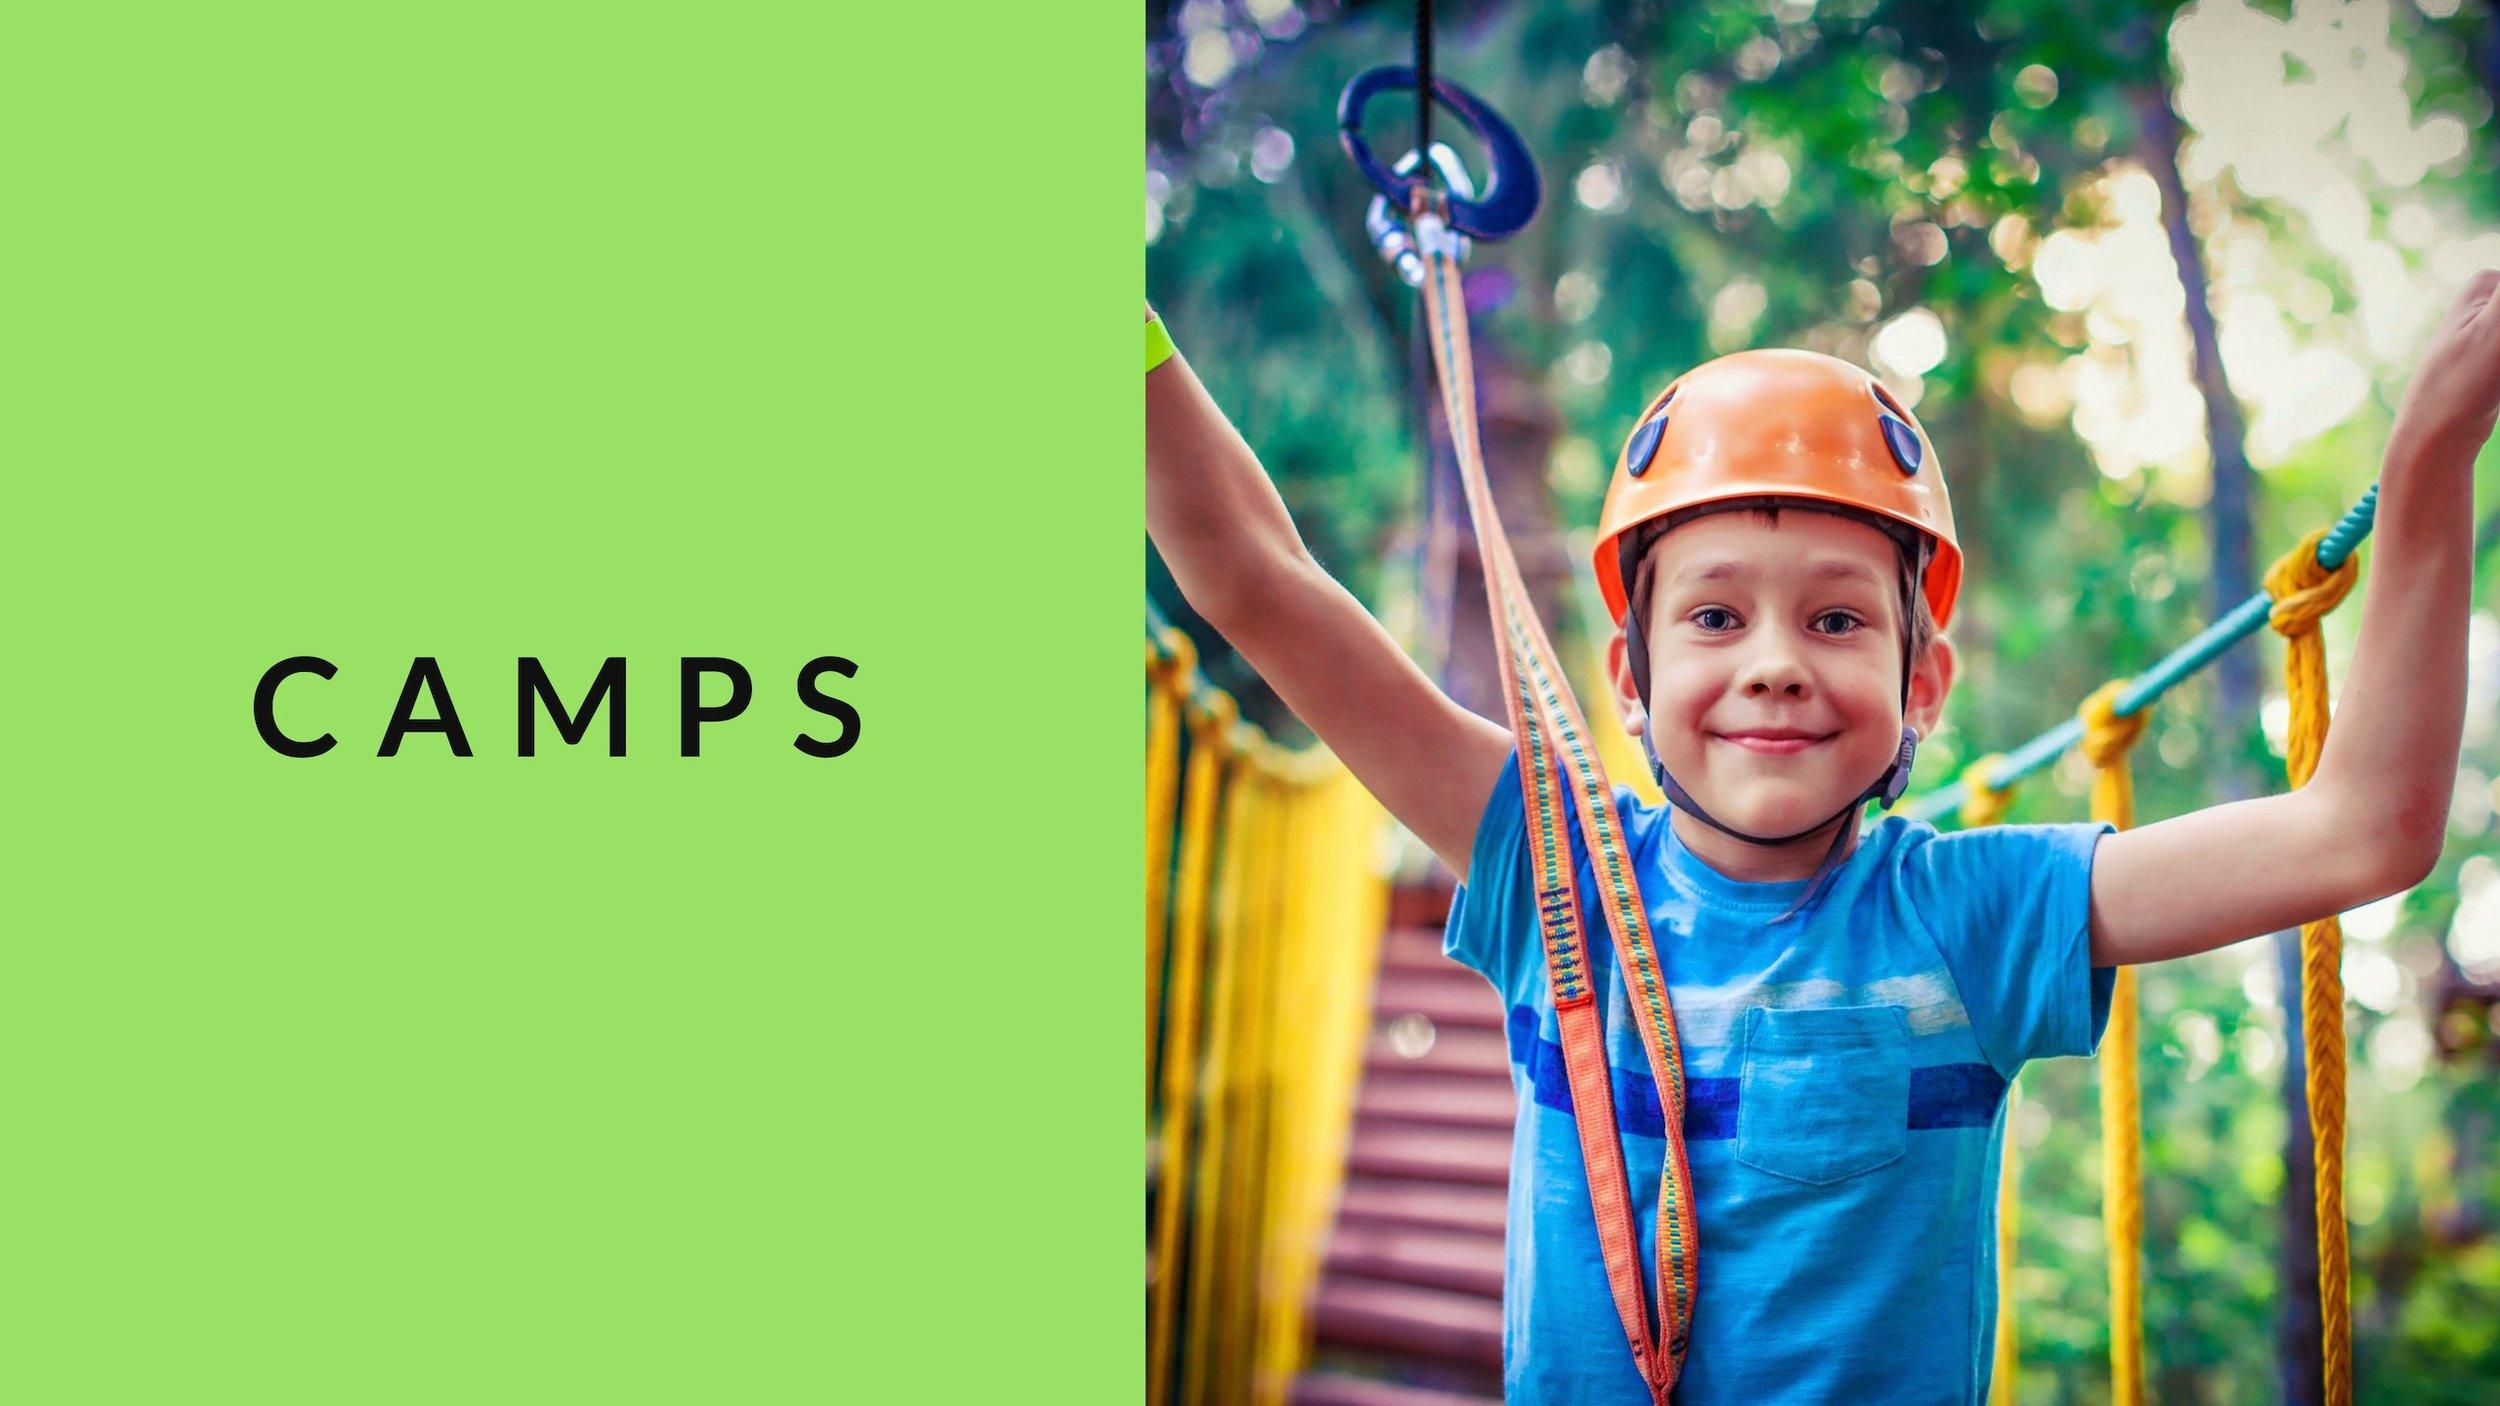 Design - Camps -txt-jpeg.jpg